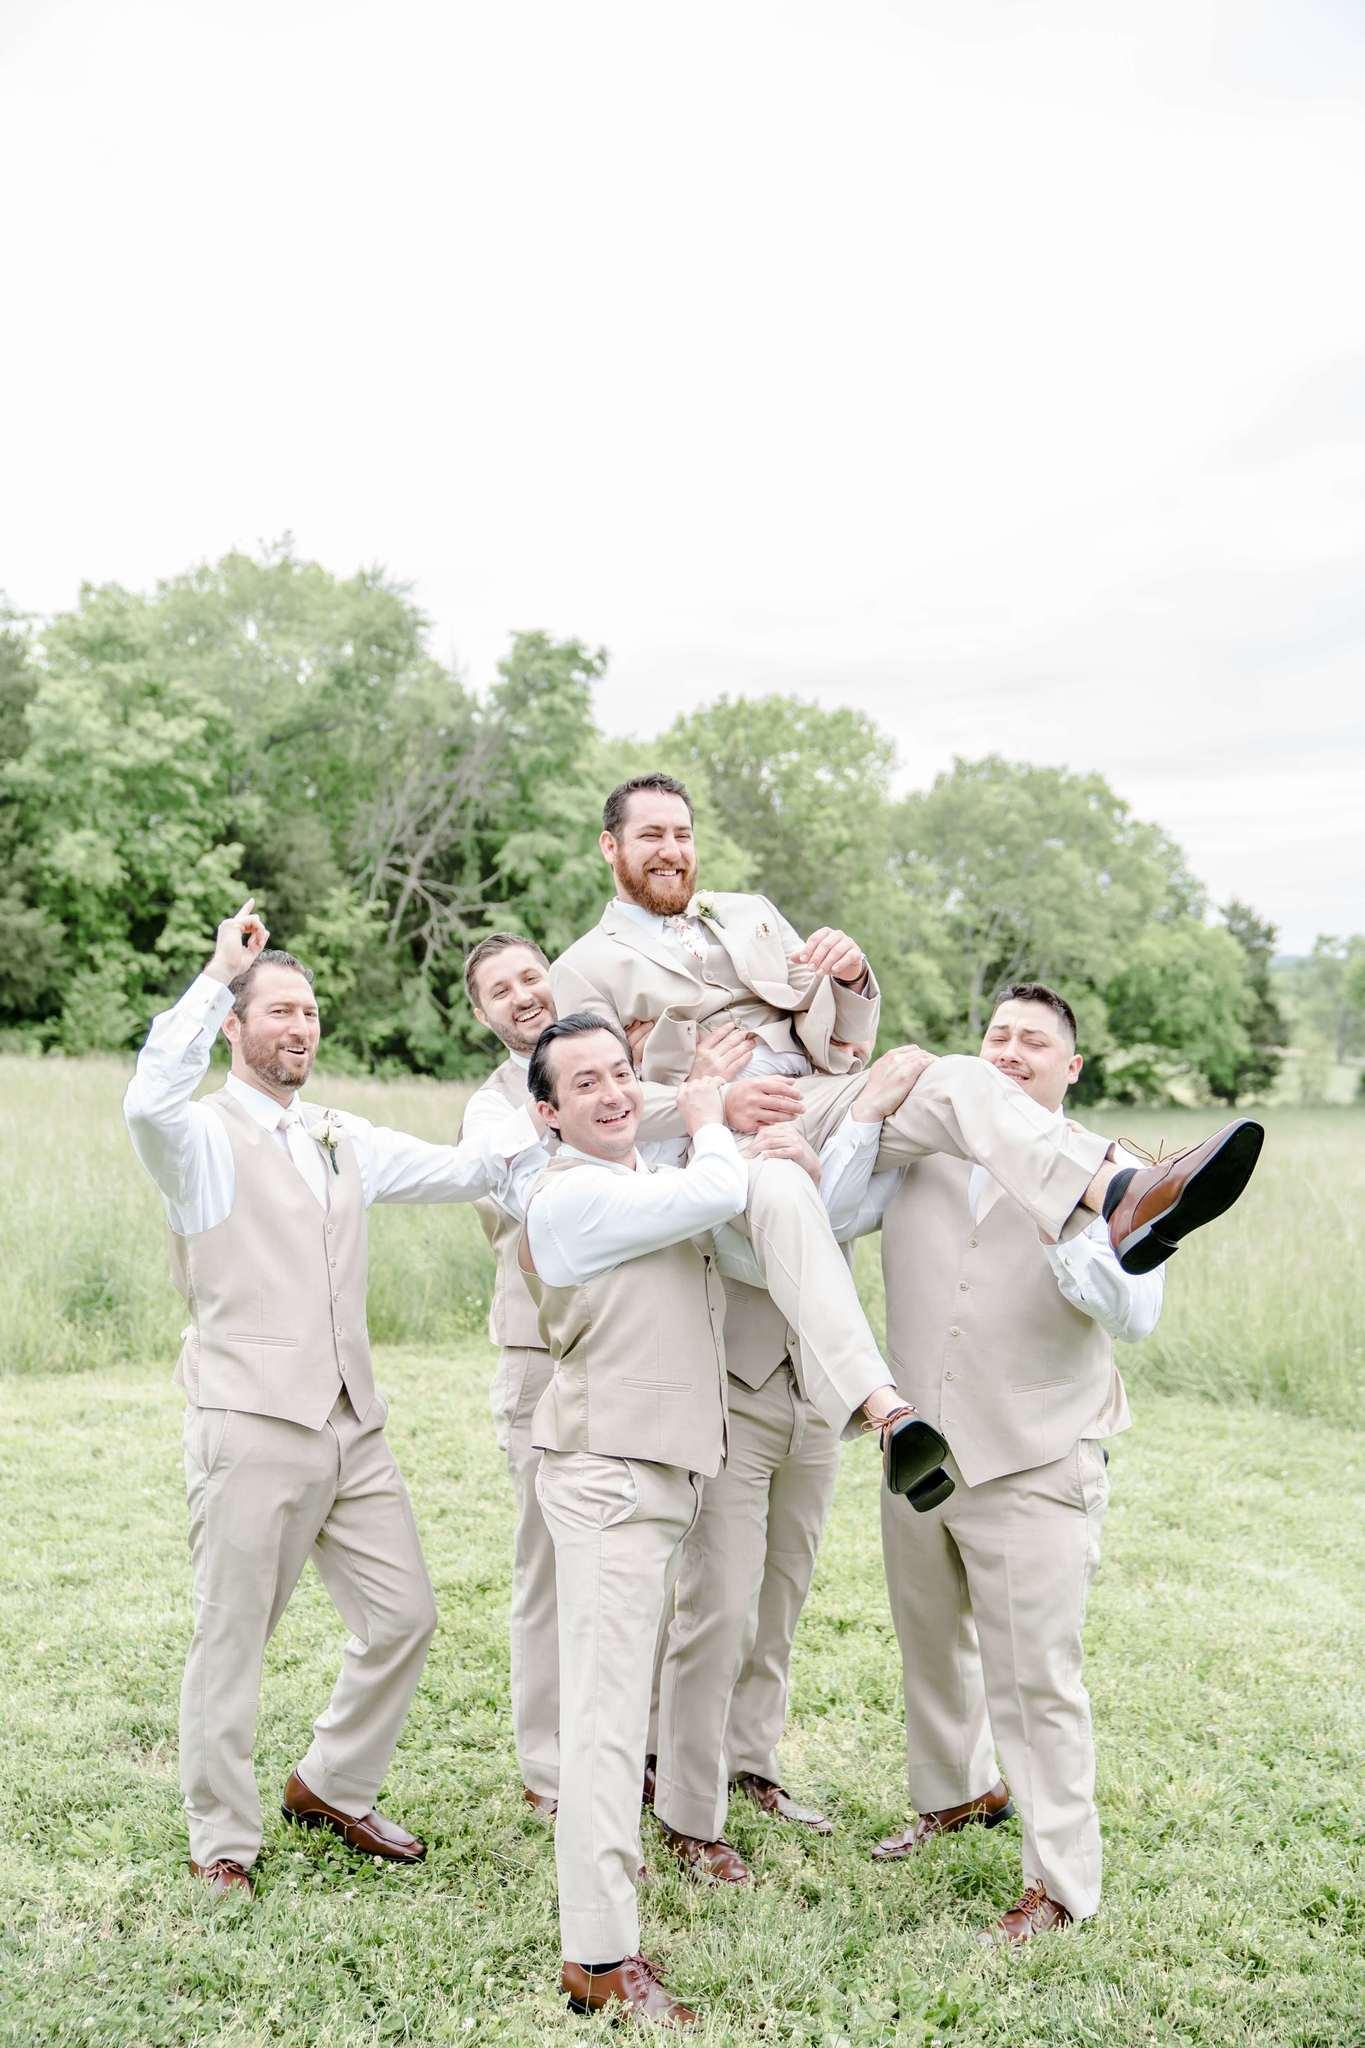 Funny groomsman wedding photos